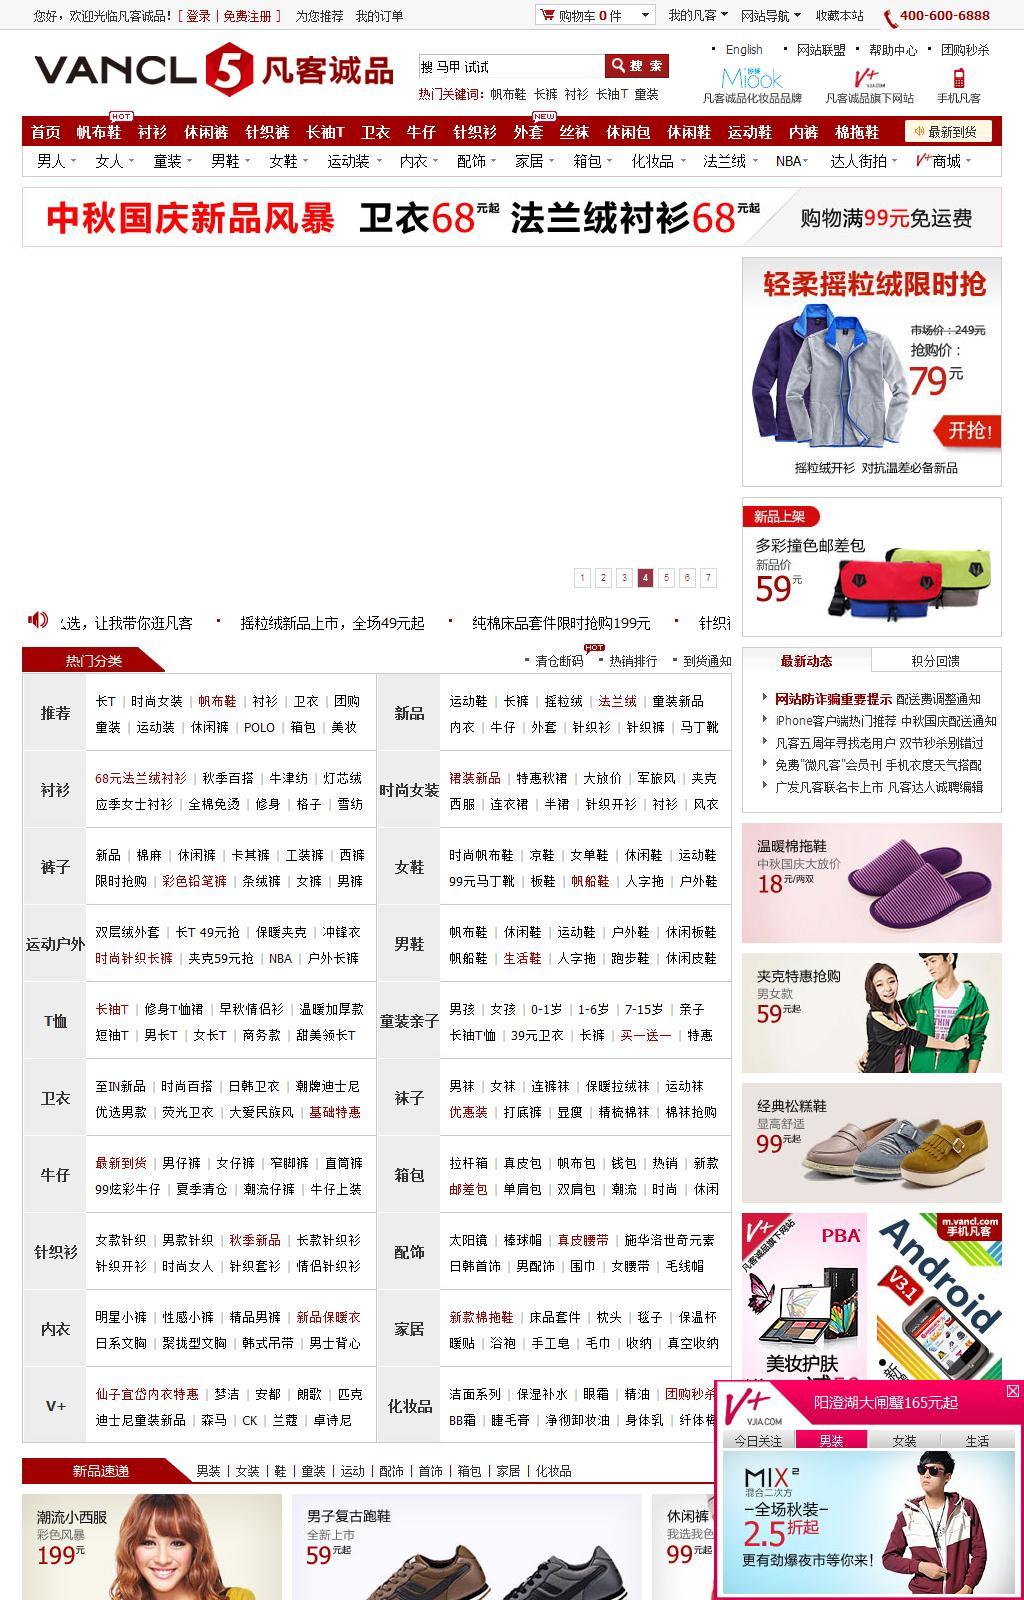 VANCL凡客诚品,互联网快时尚品牌,服装、鞋、配饰,箱包,化妆品,网上购物,货到付款,30天无条件退换货